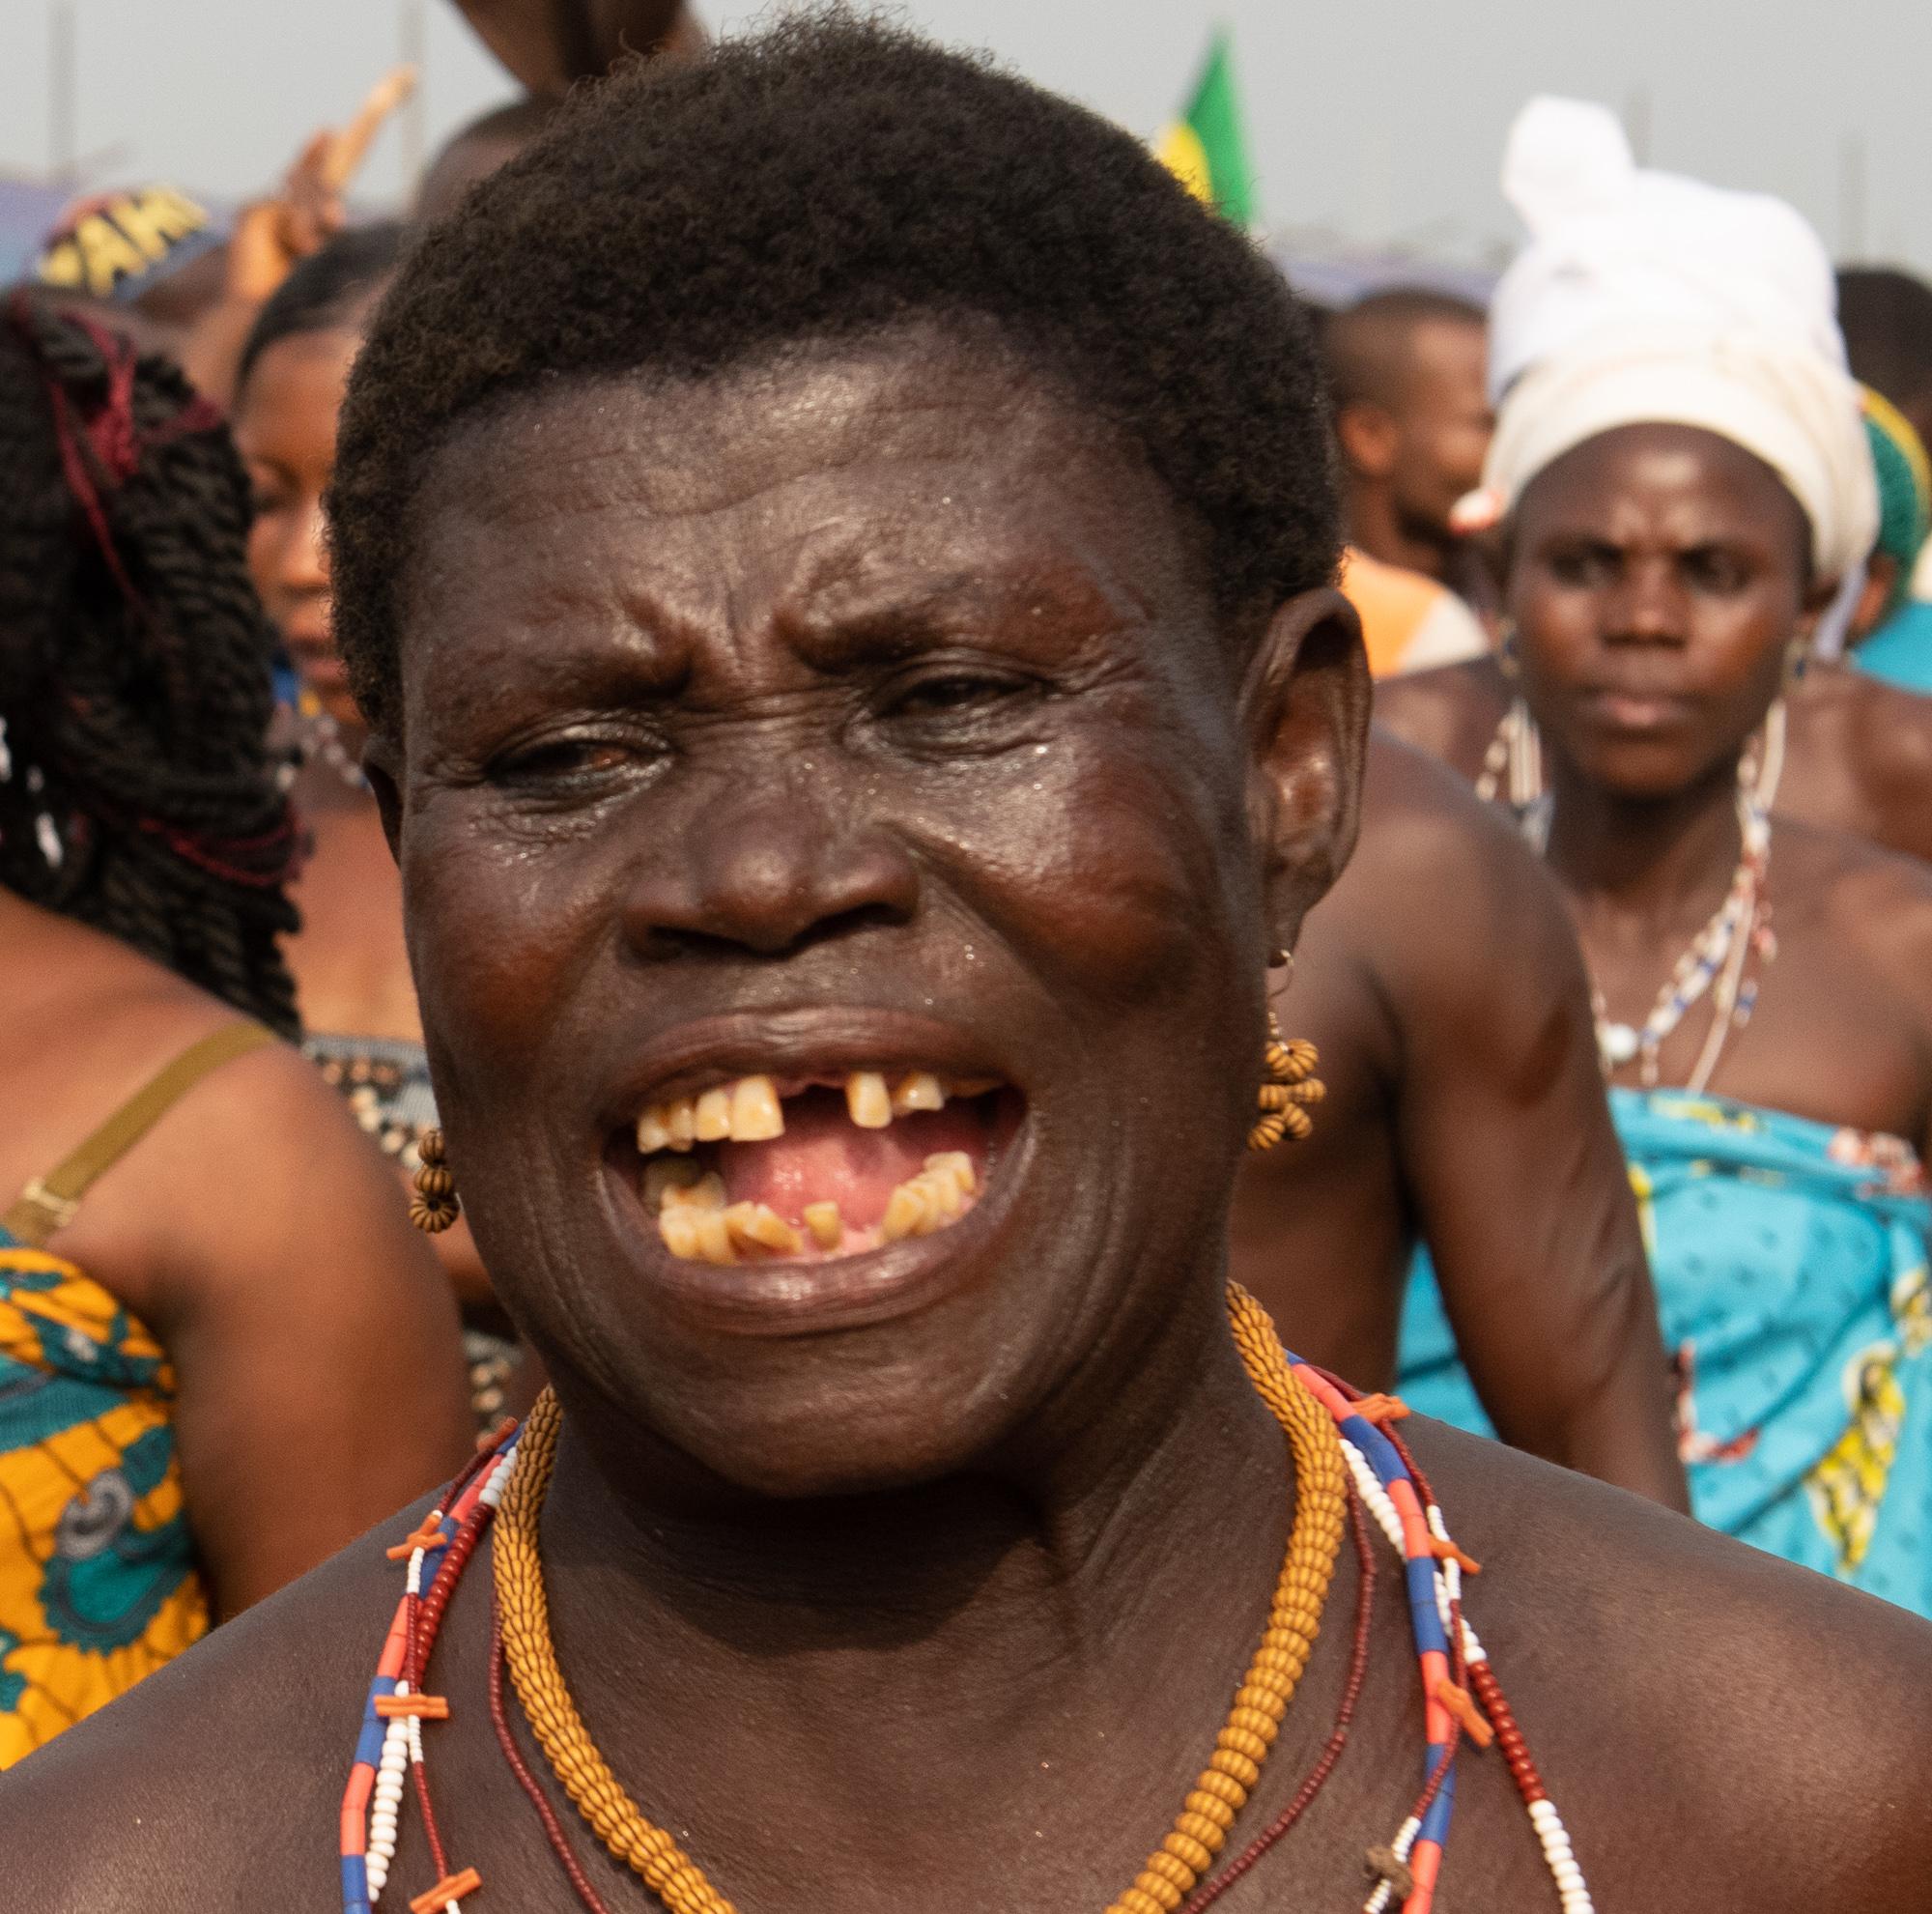 Participant. 2019 Voodoo Festival, Ouidah, Benin